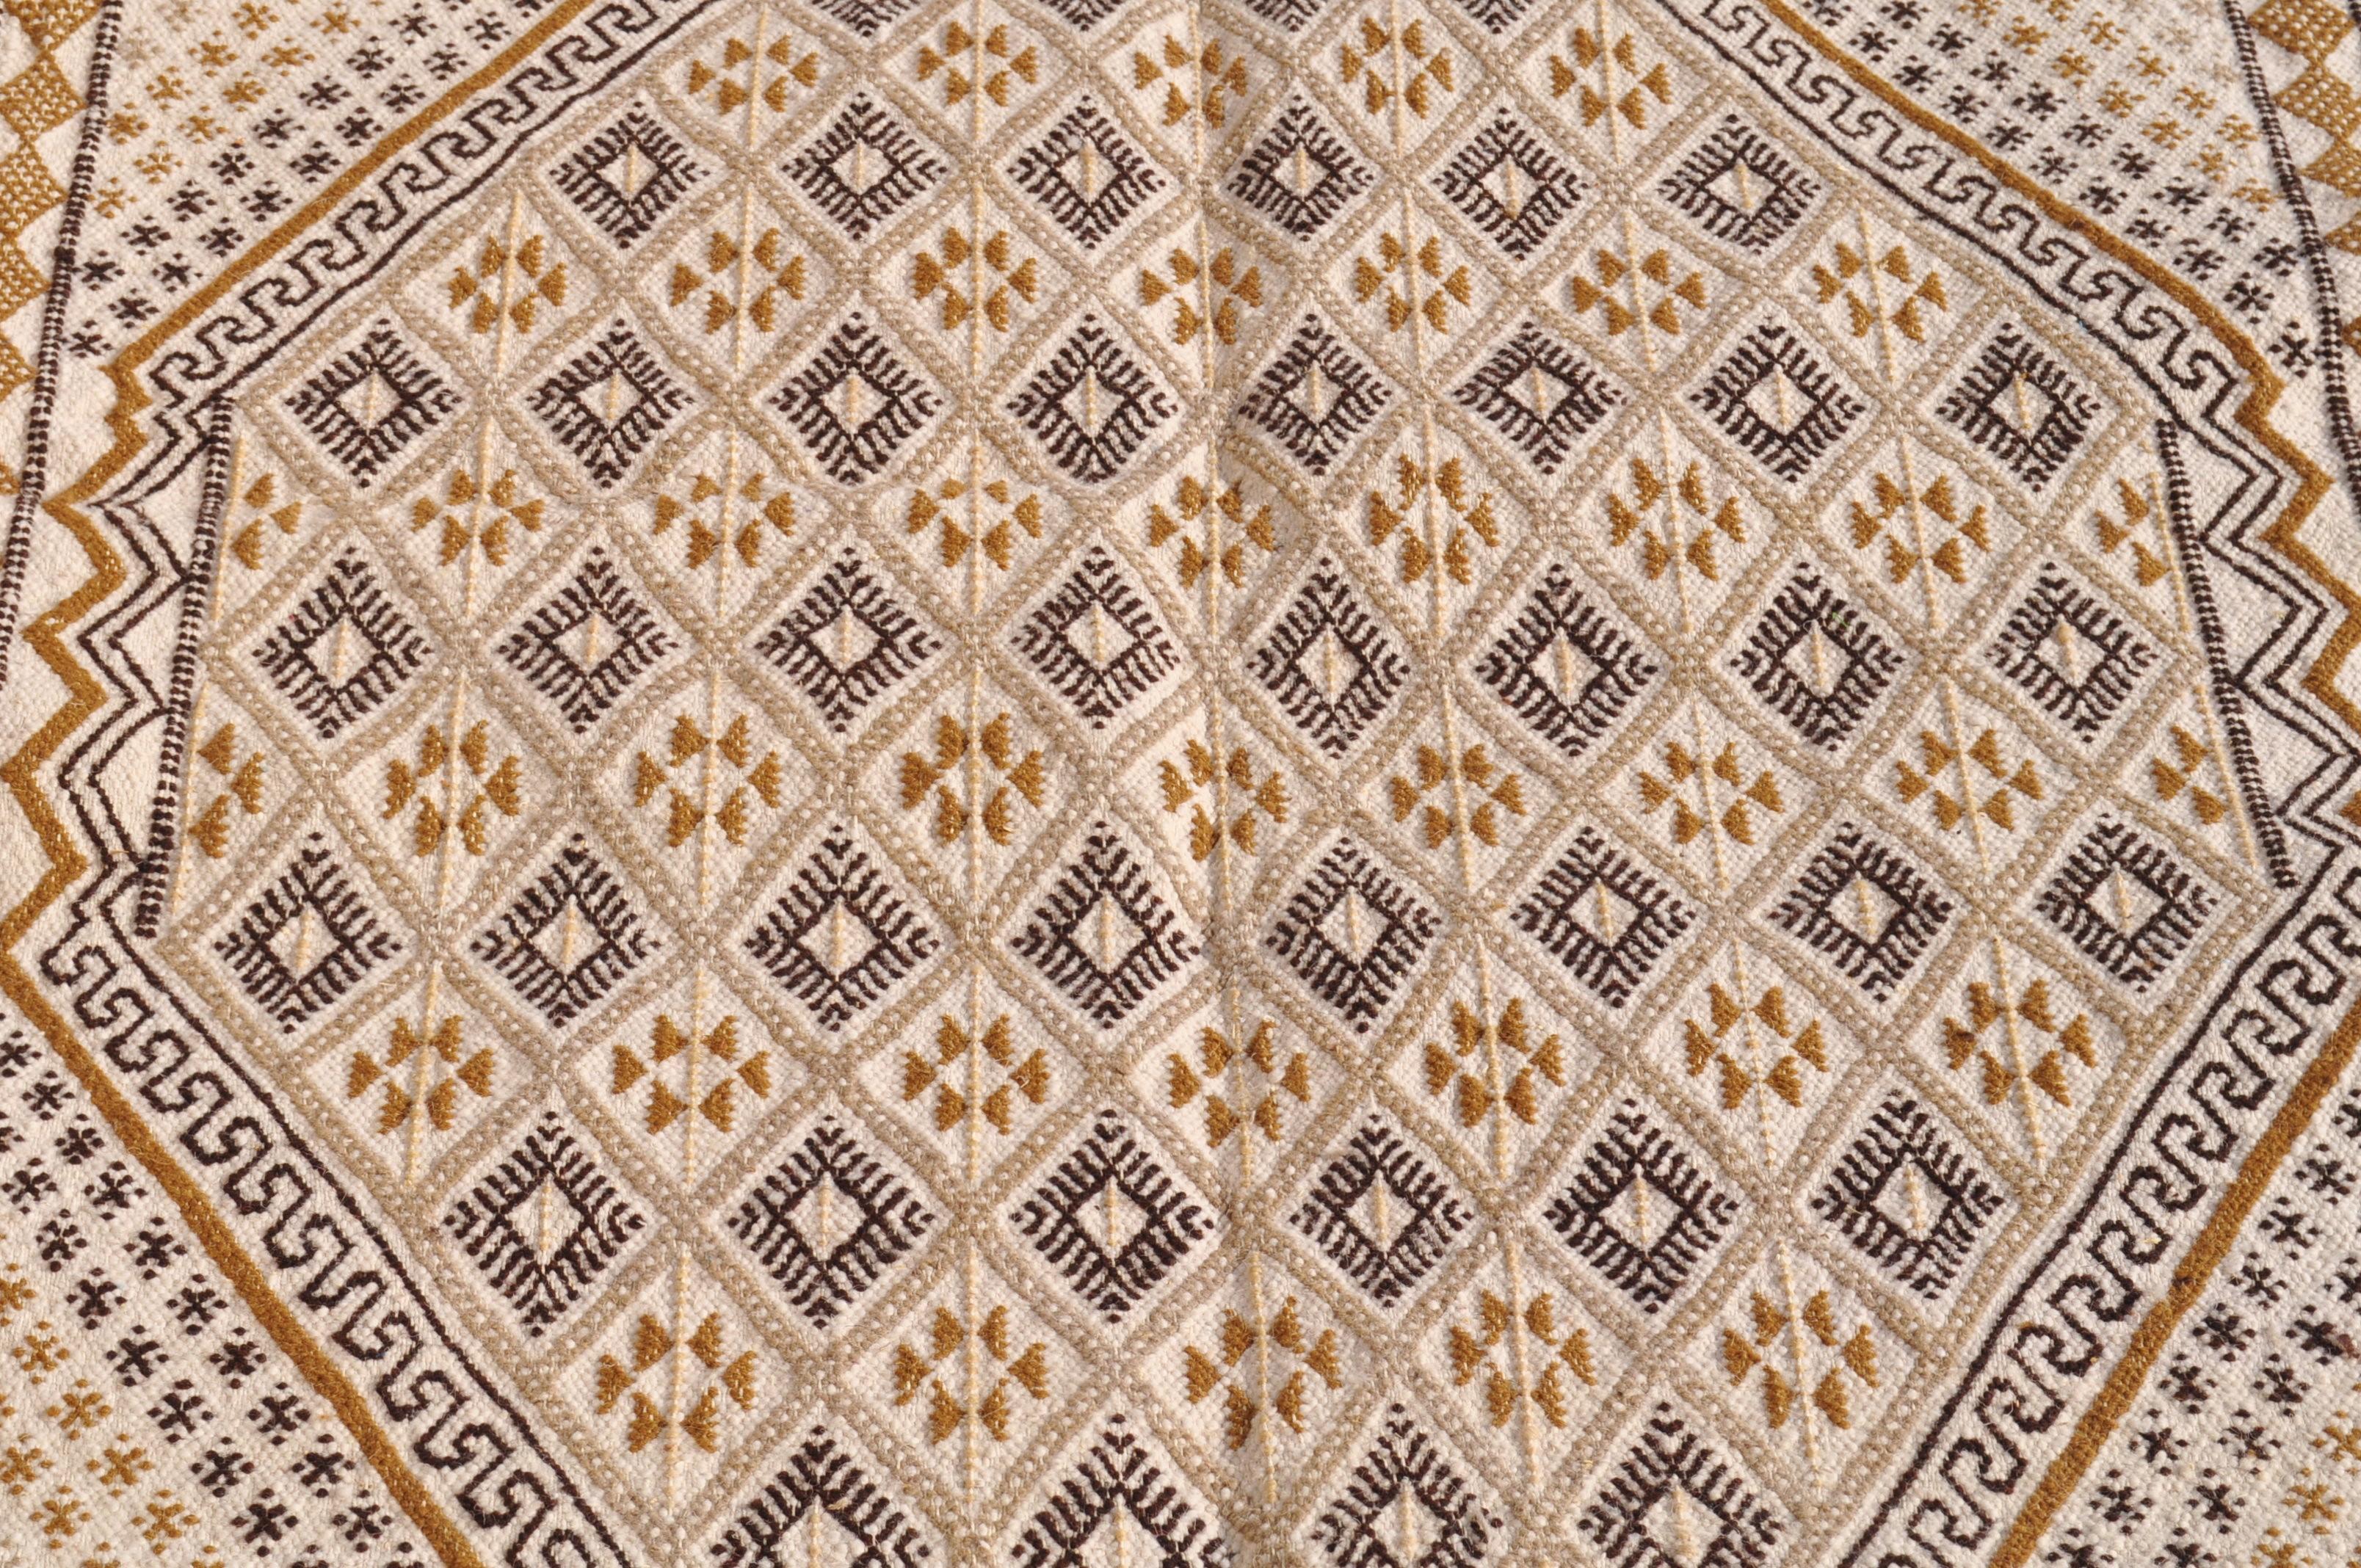 tapis moyens tapis tunisiens et marocains en laine tapis tapis bembla. Black Bedroom Furniture Sets. Home Design Ideas